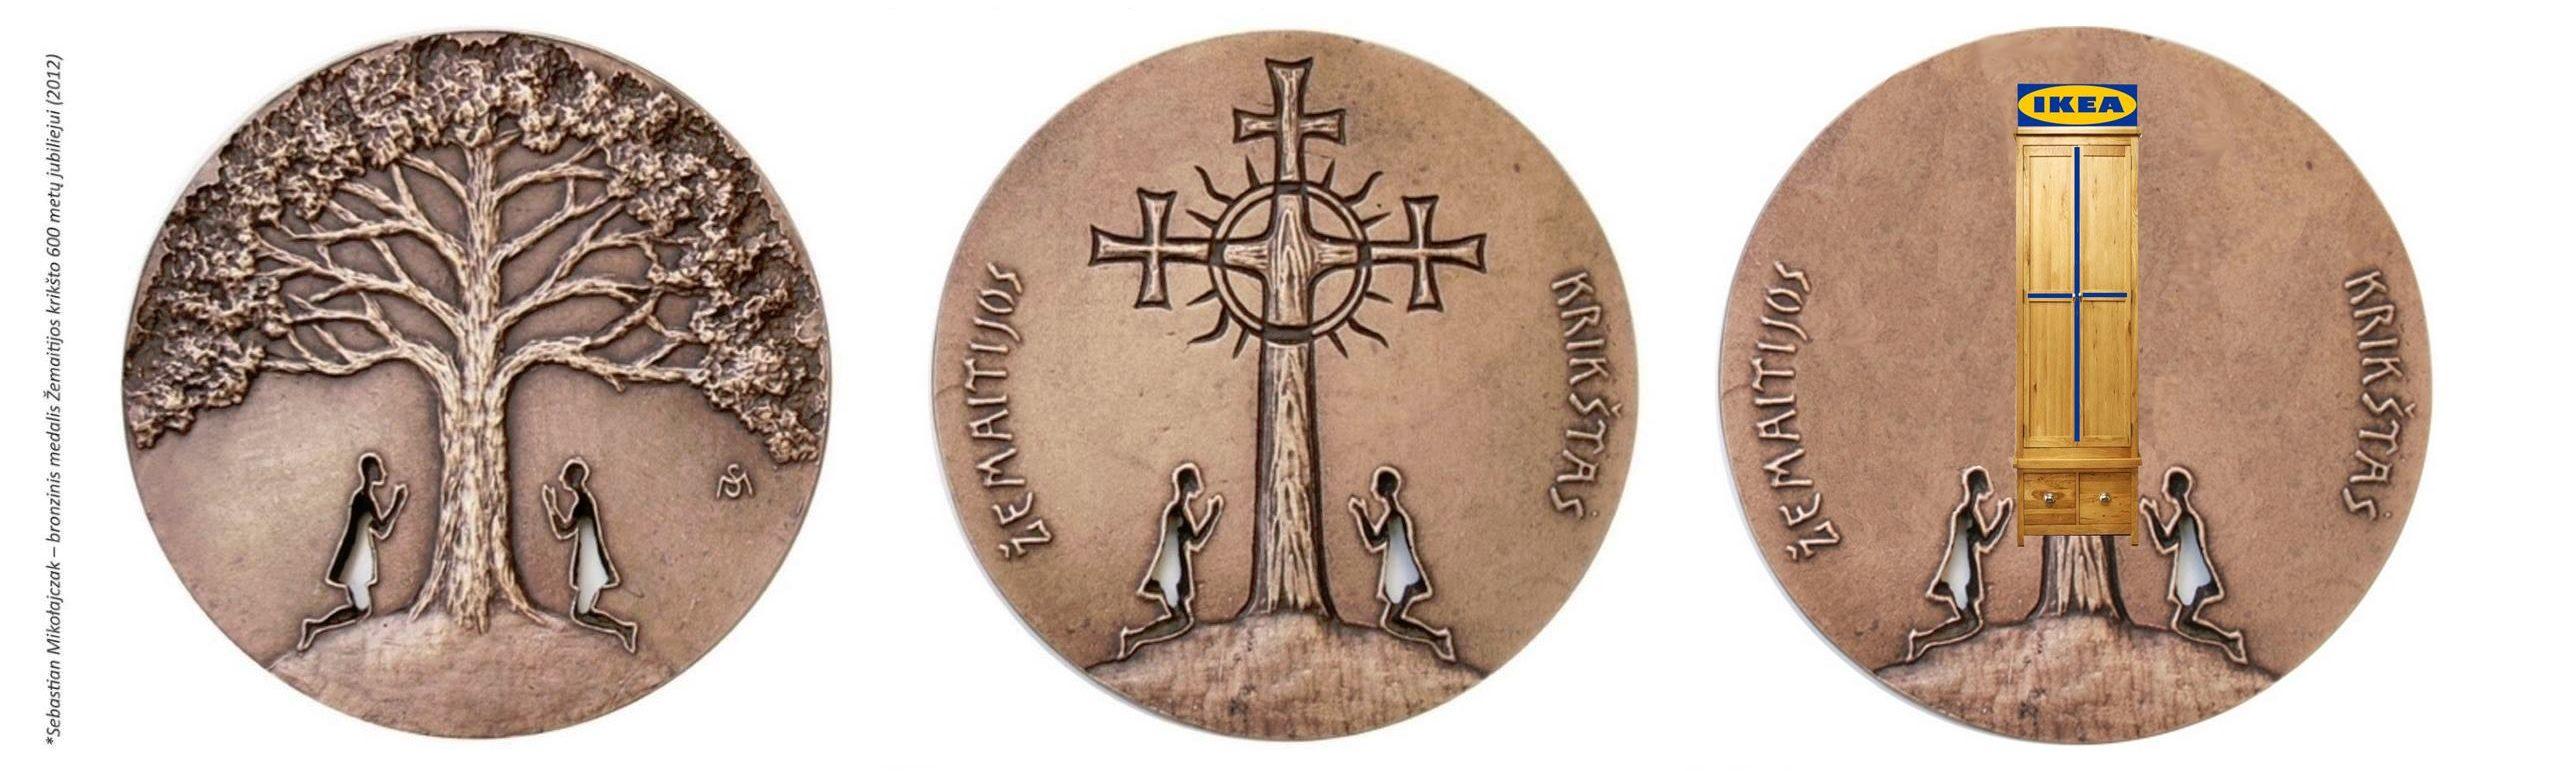 meldziasis-medziams-alkas-lt-koliazas